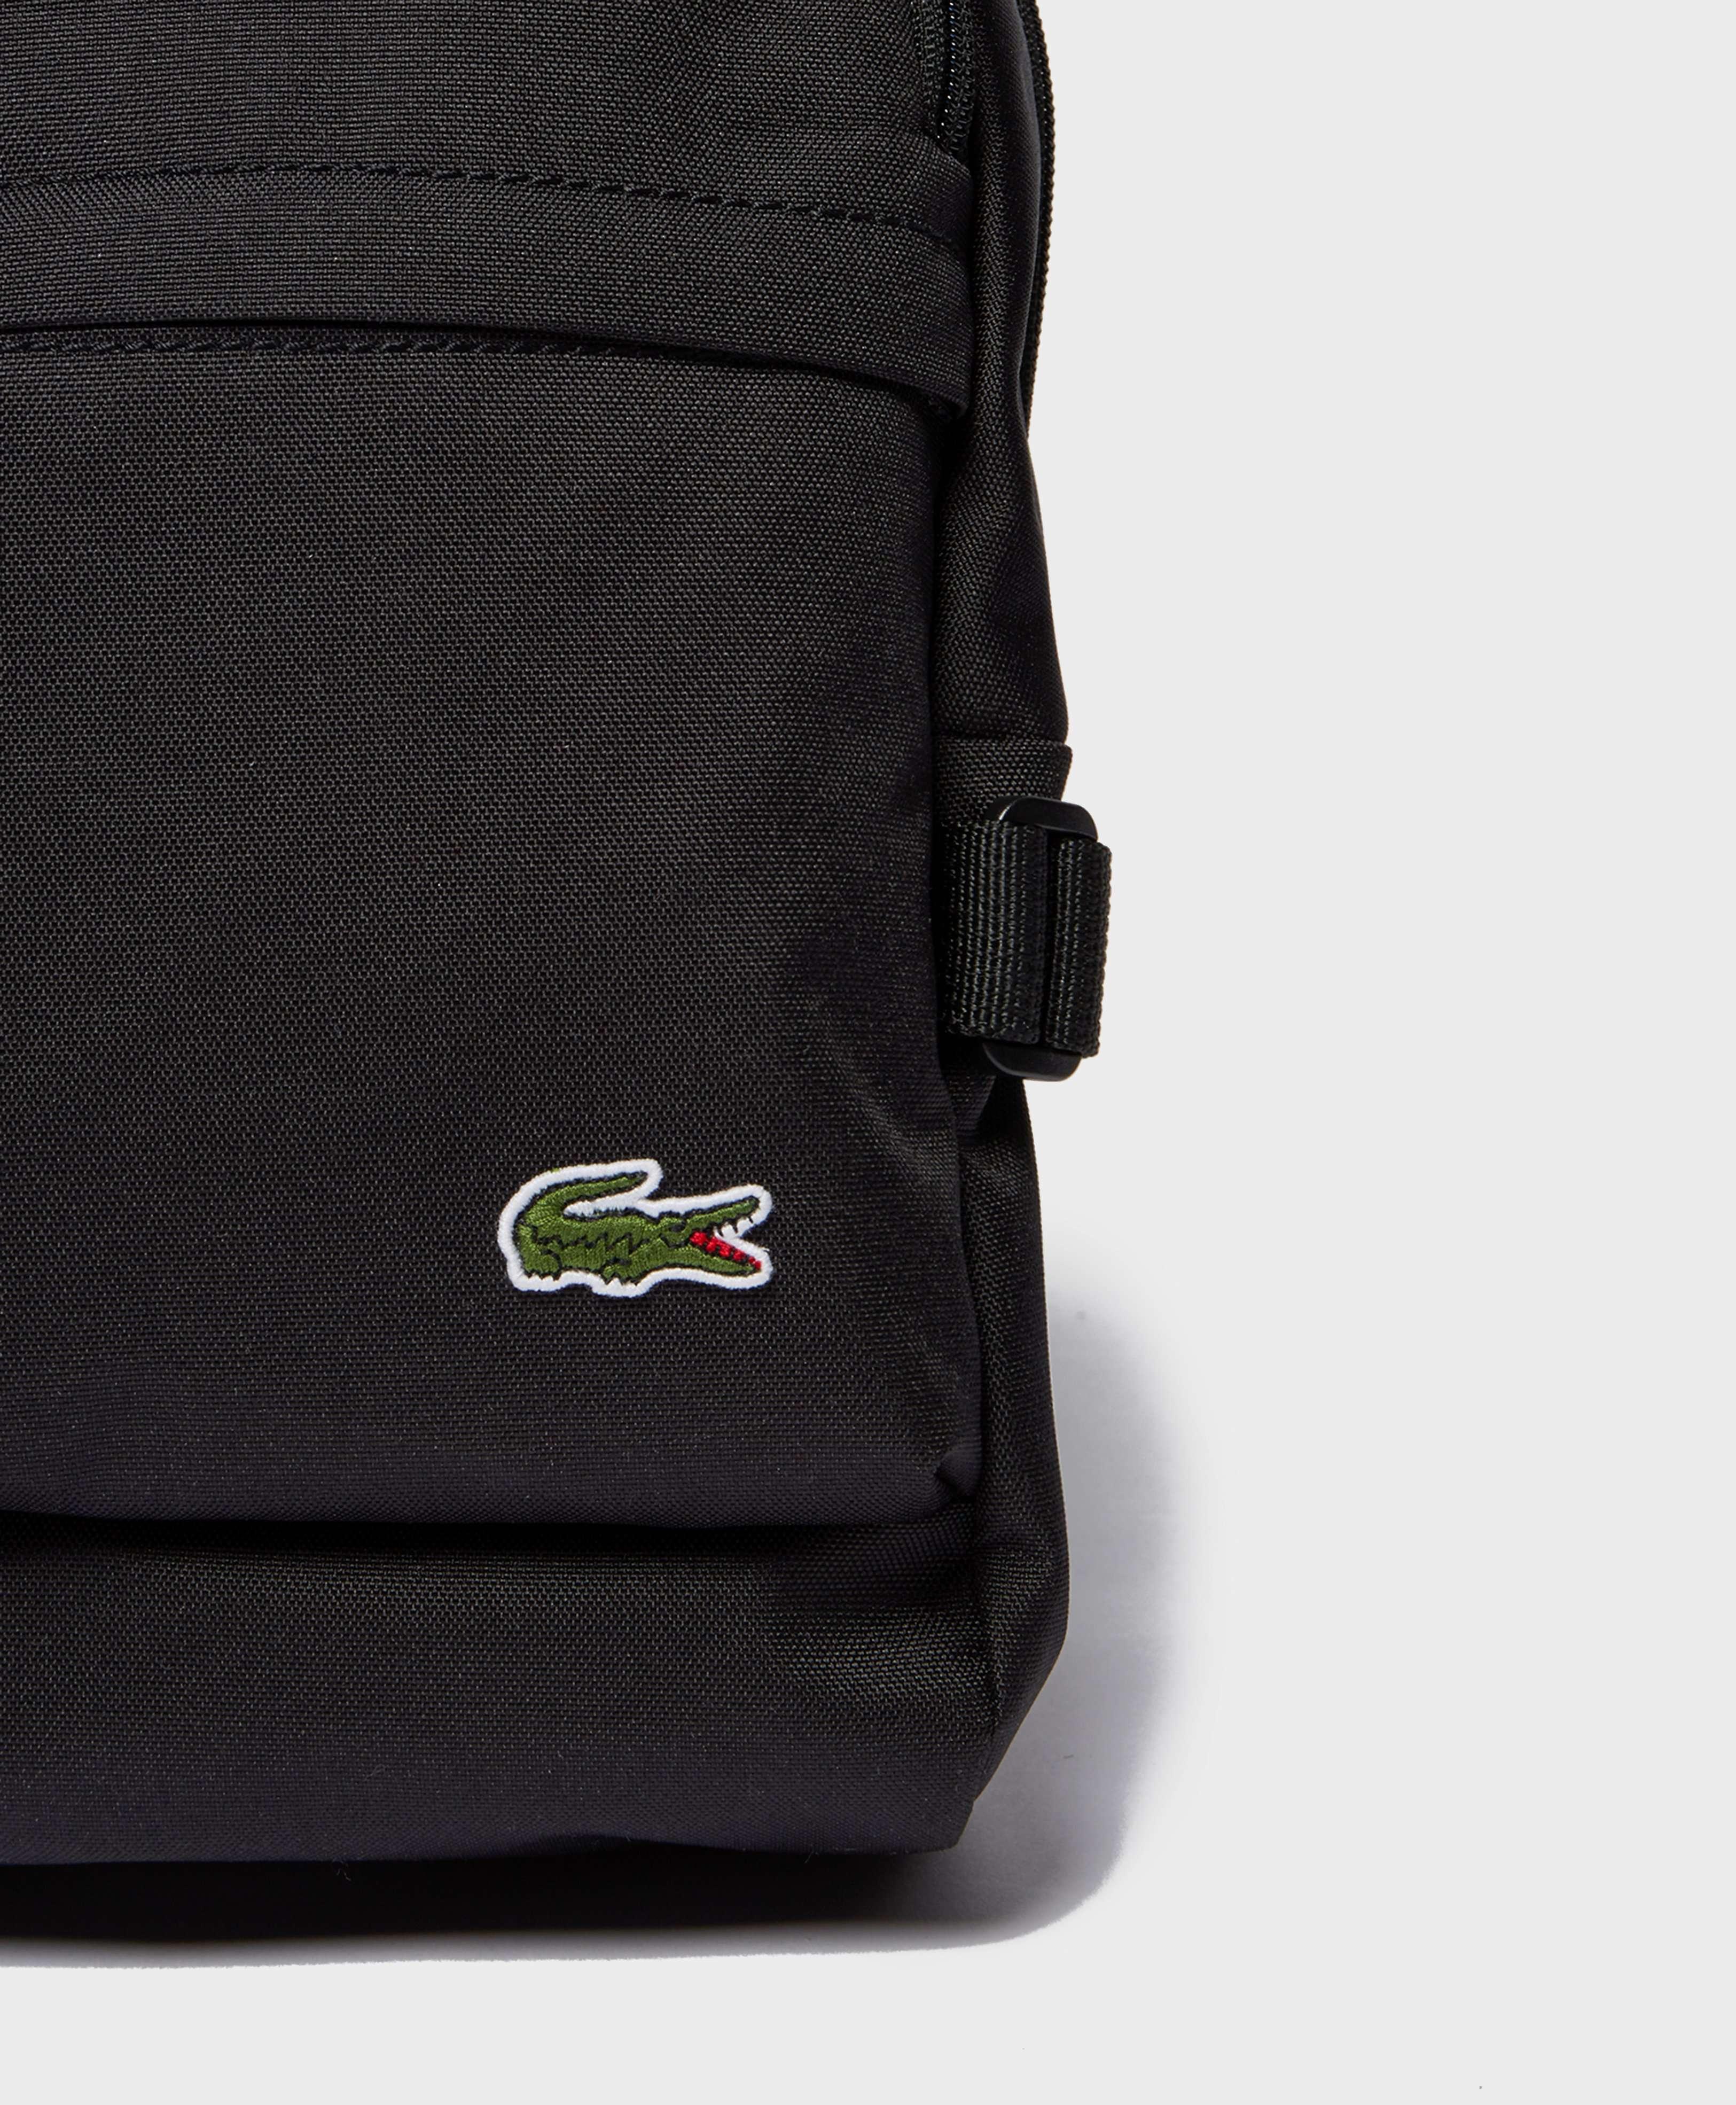 Lacoste Croc Bodybag